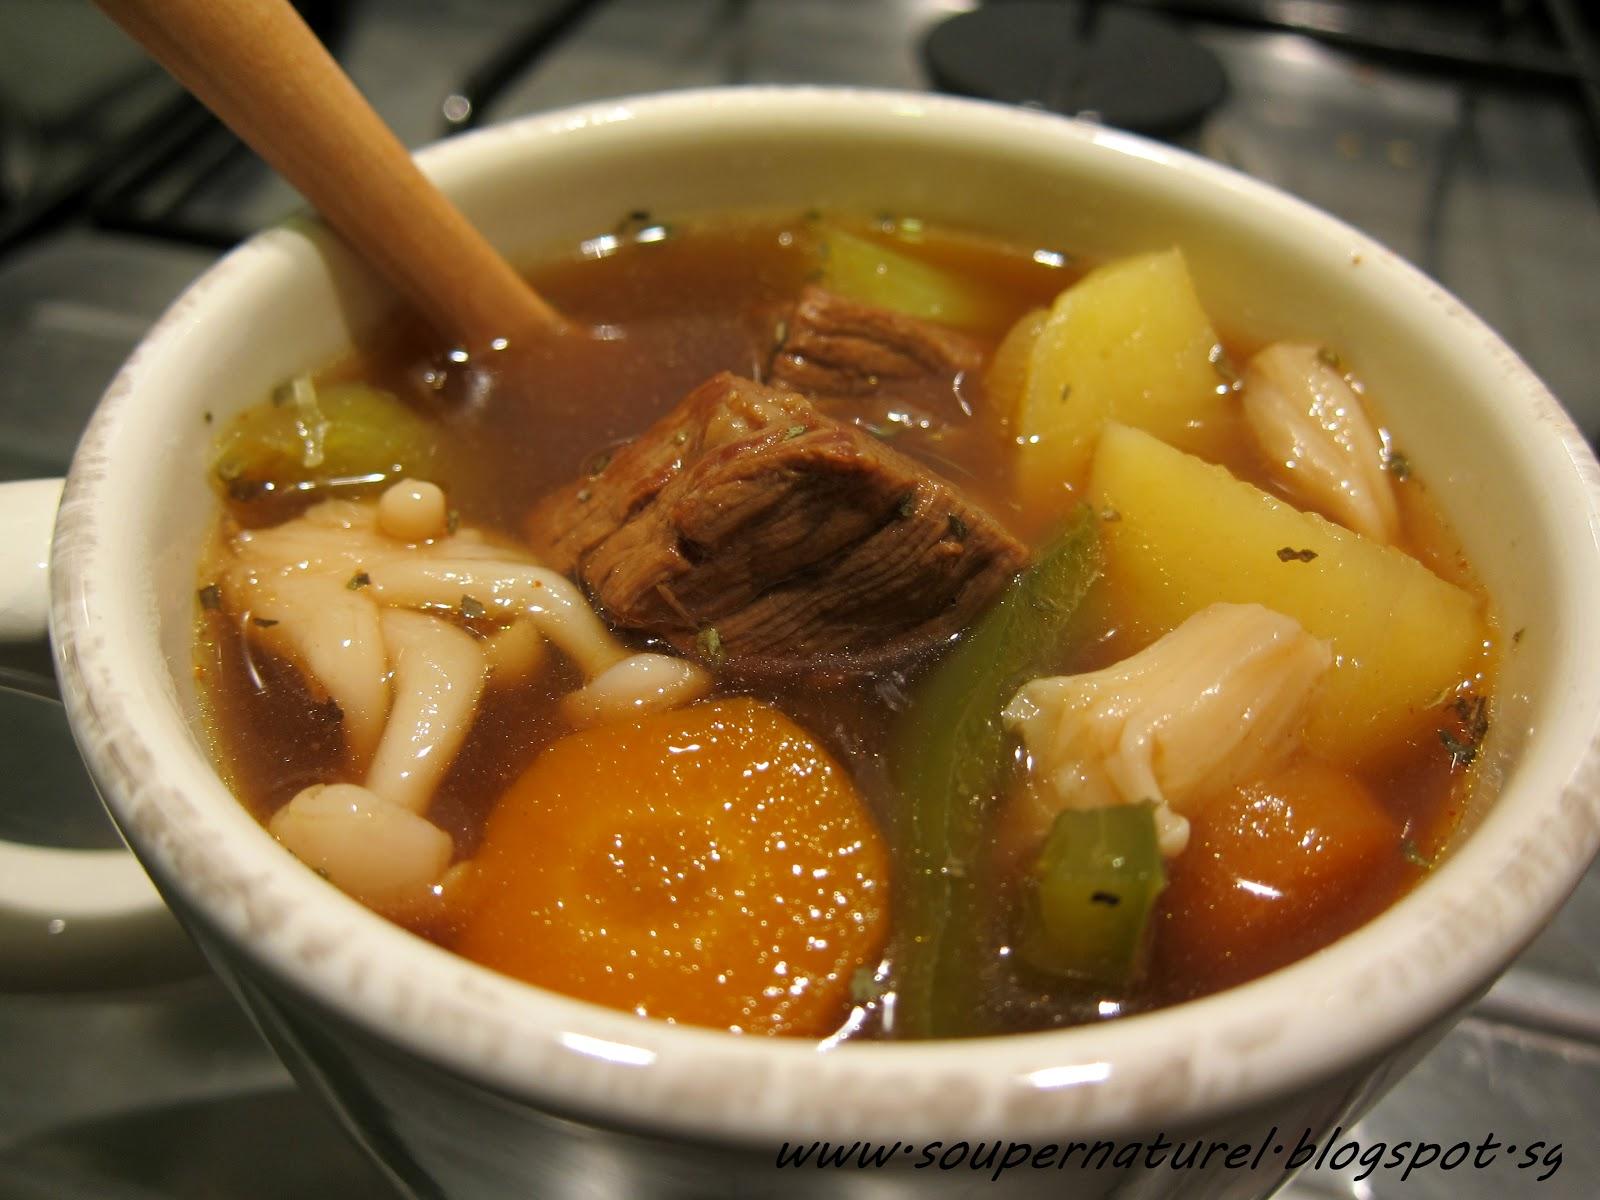 Taiwan Pineapple Beer Beef Stew! | Soupernaturel